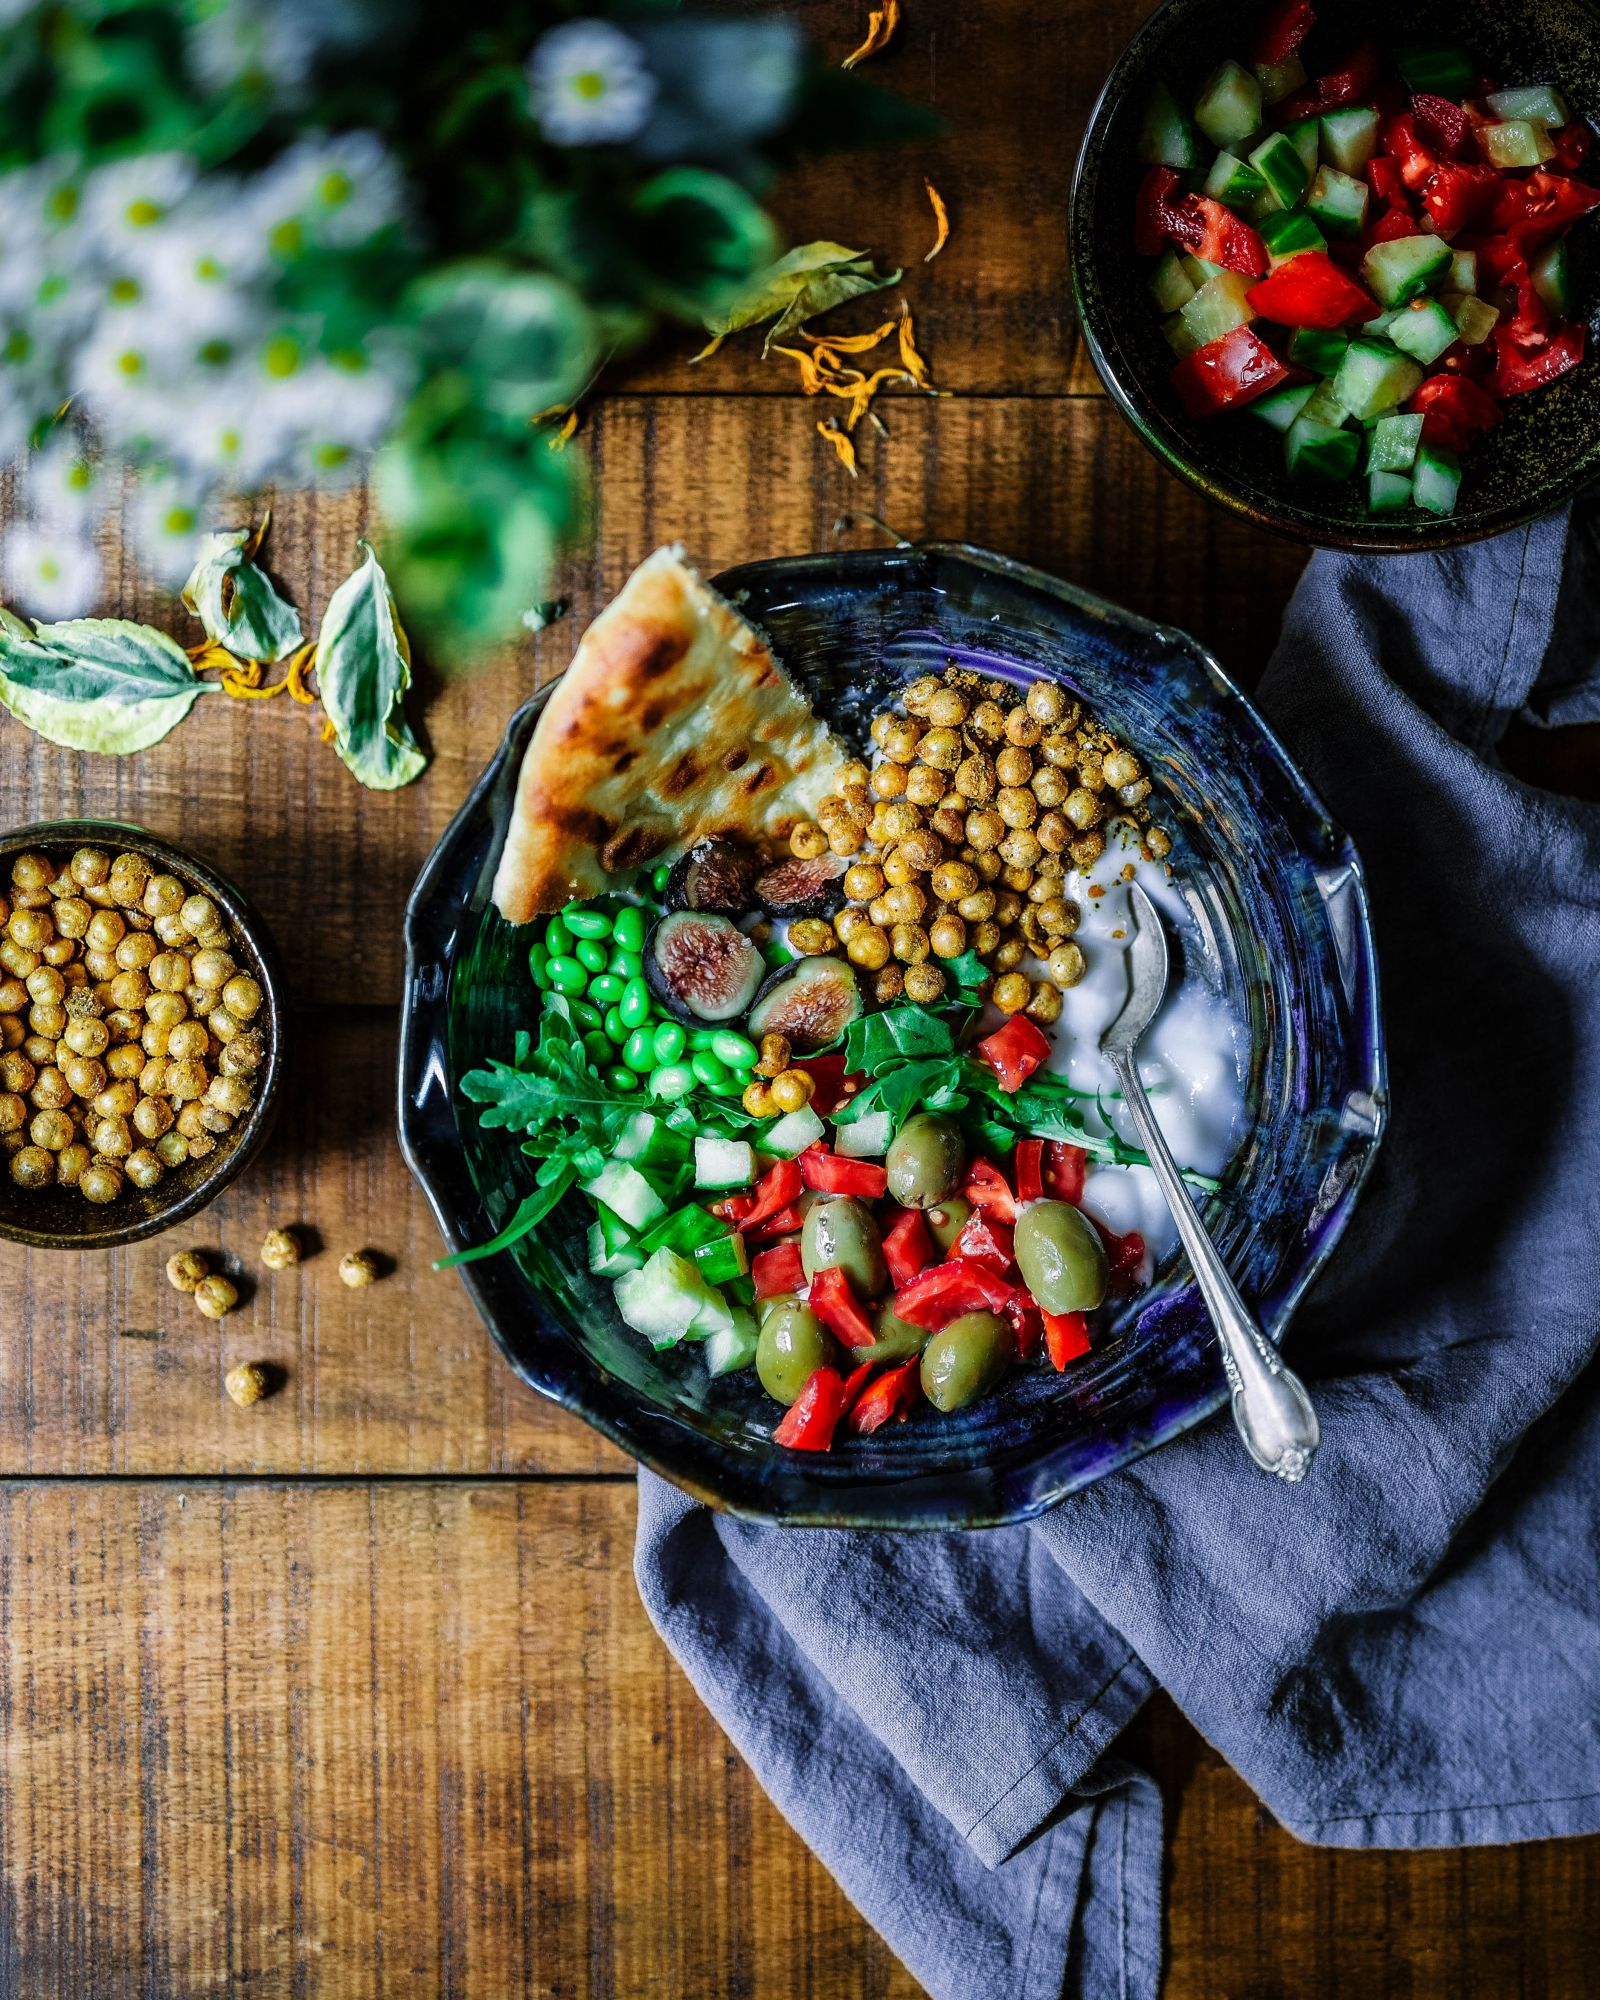 Vegan Tips: 5 Easy Alternative Sources of Protein